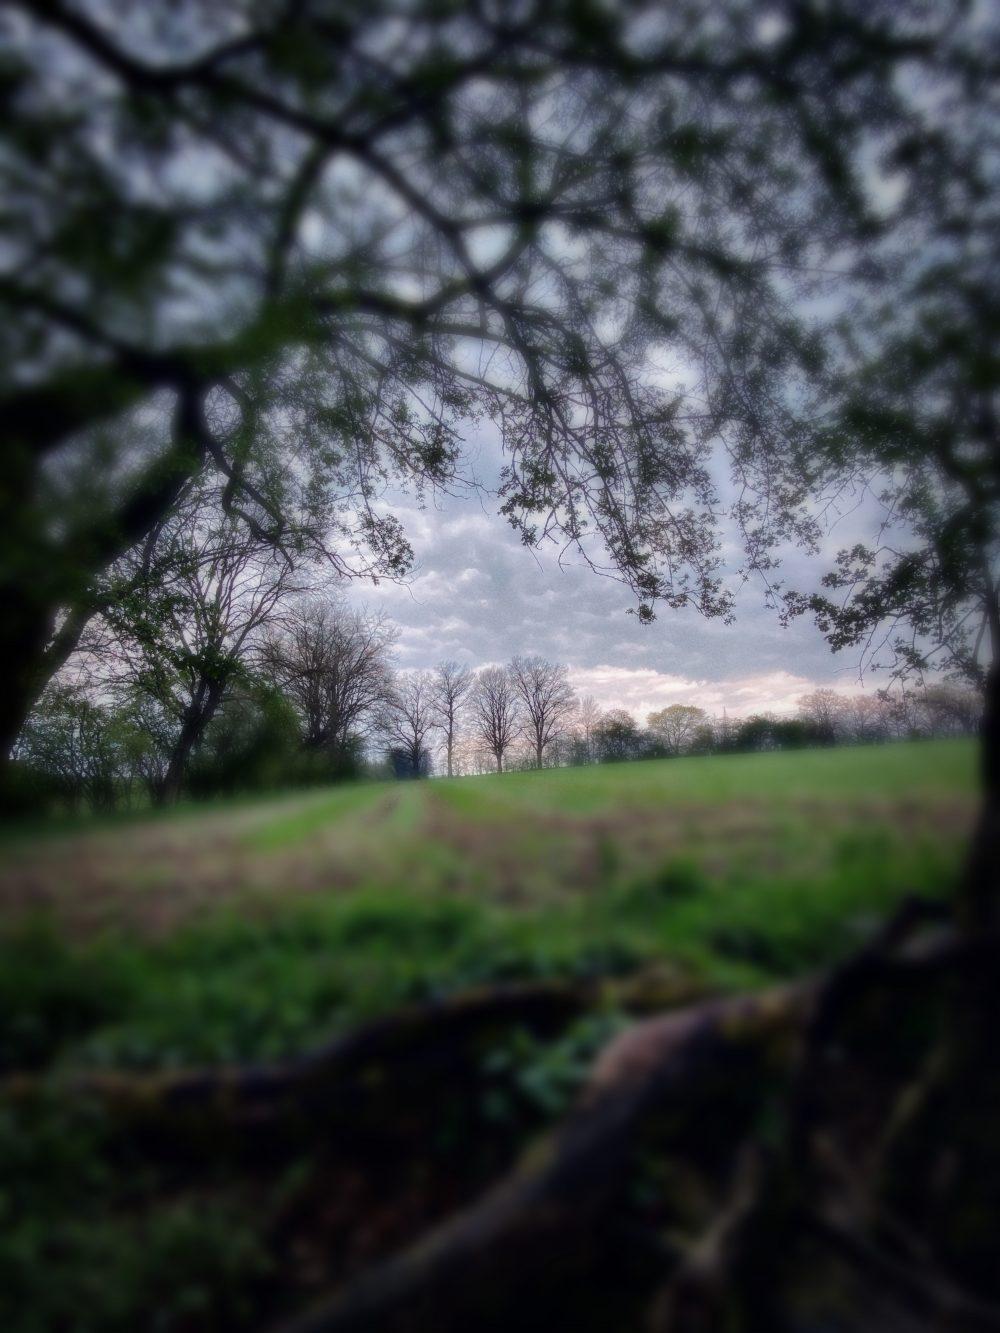 Tief im Wald (First Insta Reels)